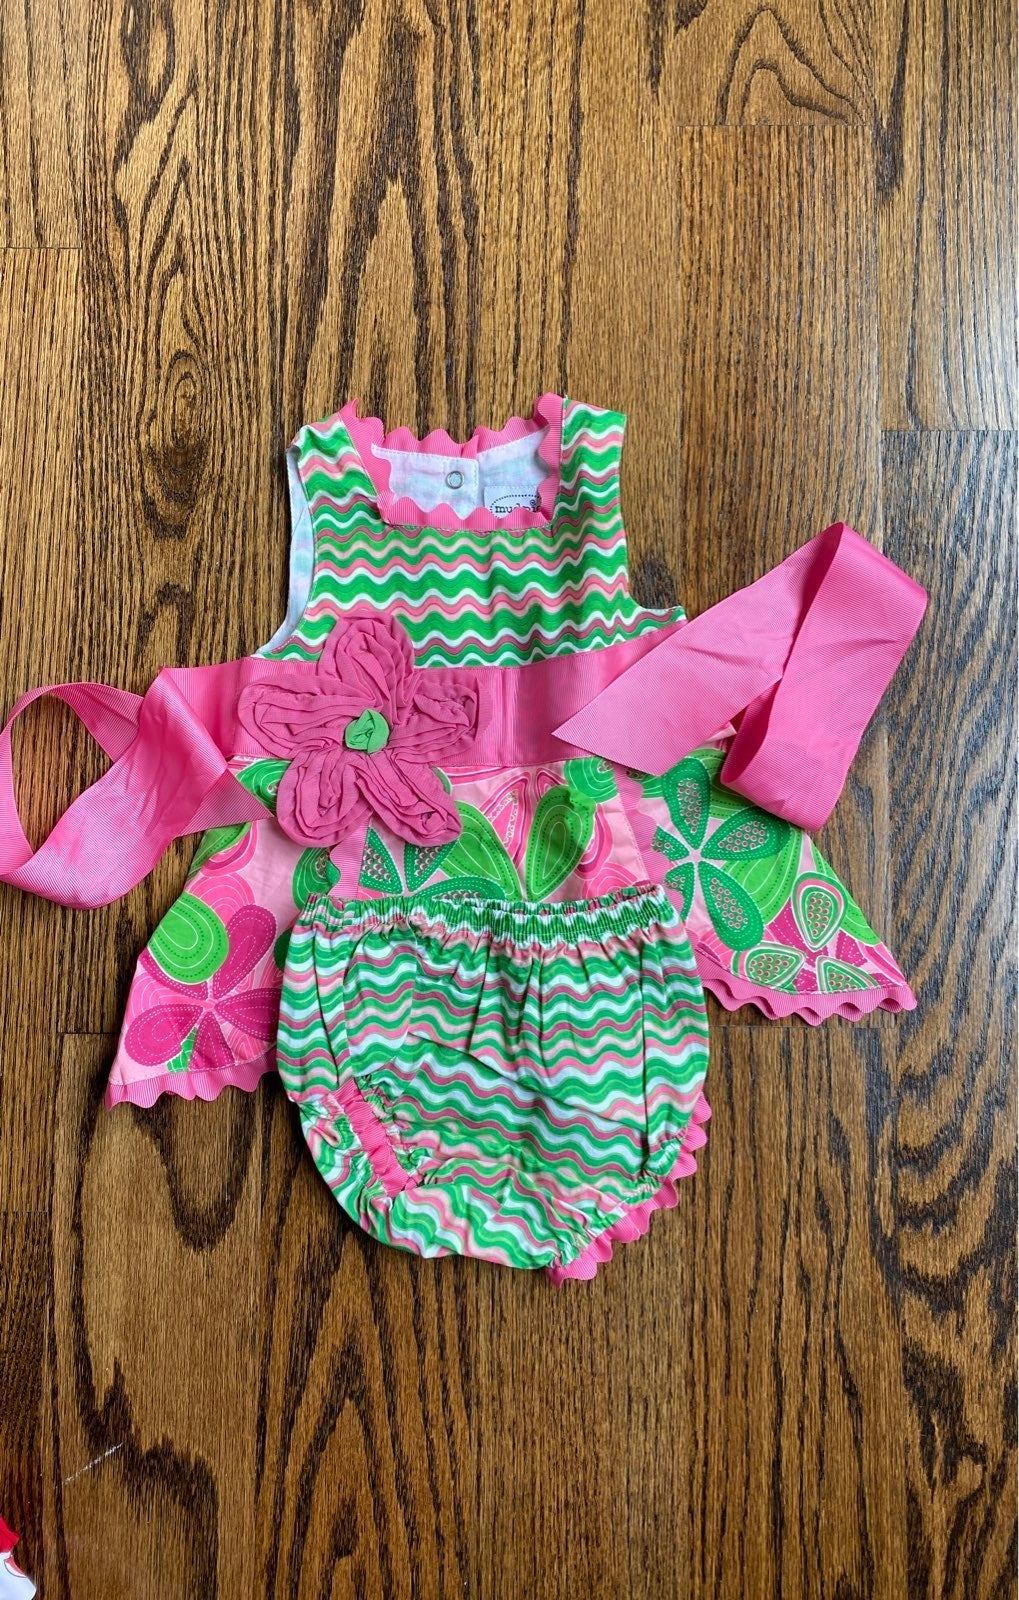 Mud pie baby girl swing dress & bloomers